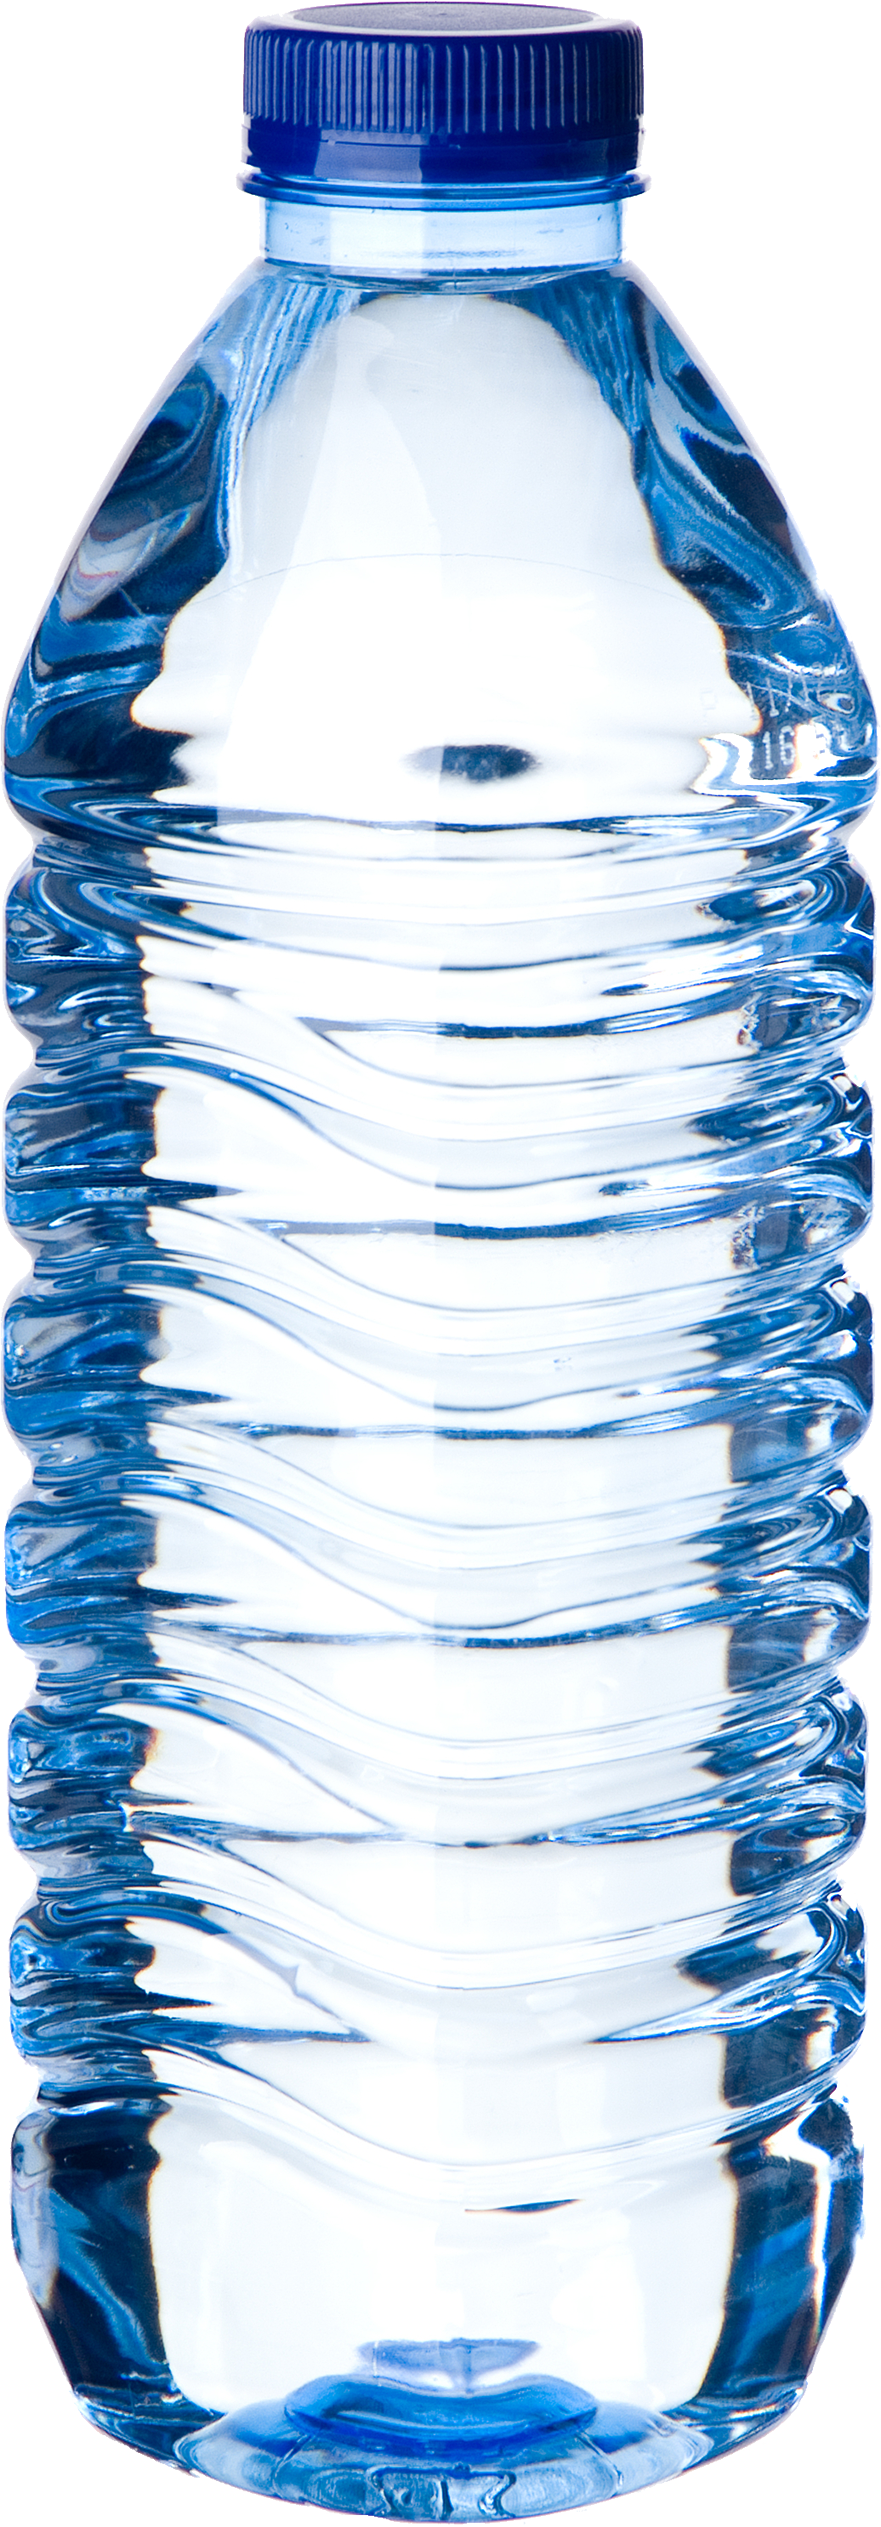 Imagen botella de fantendo wiki fandom powered by wikia - Fauteuil en polycarbonate transparent ...